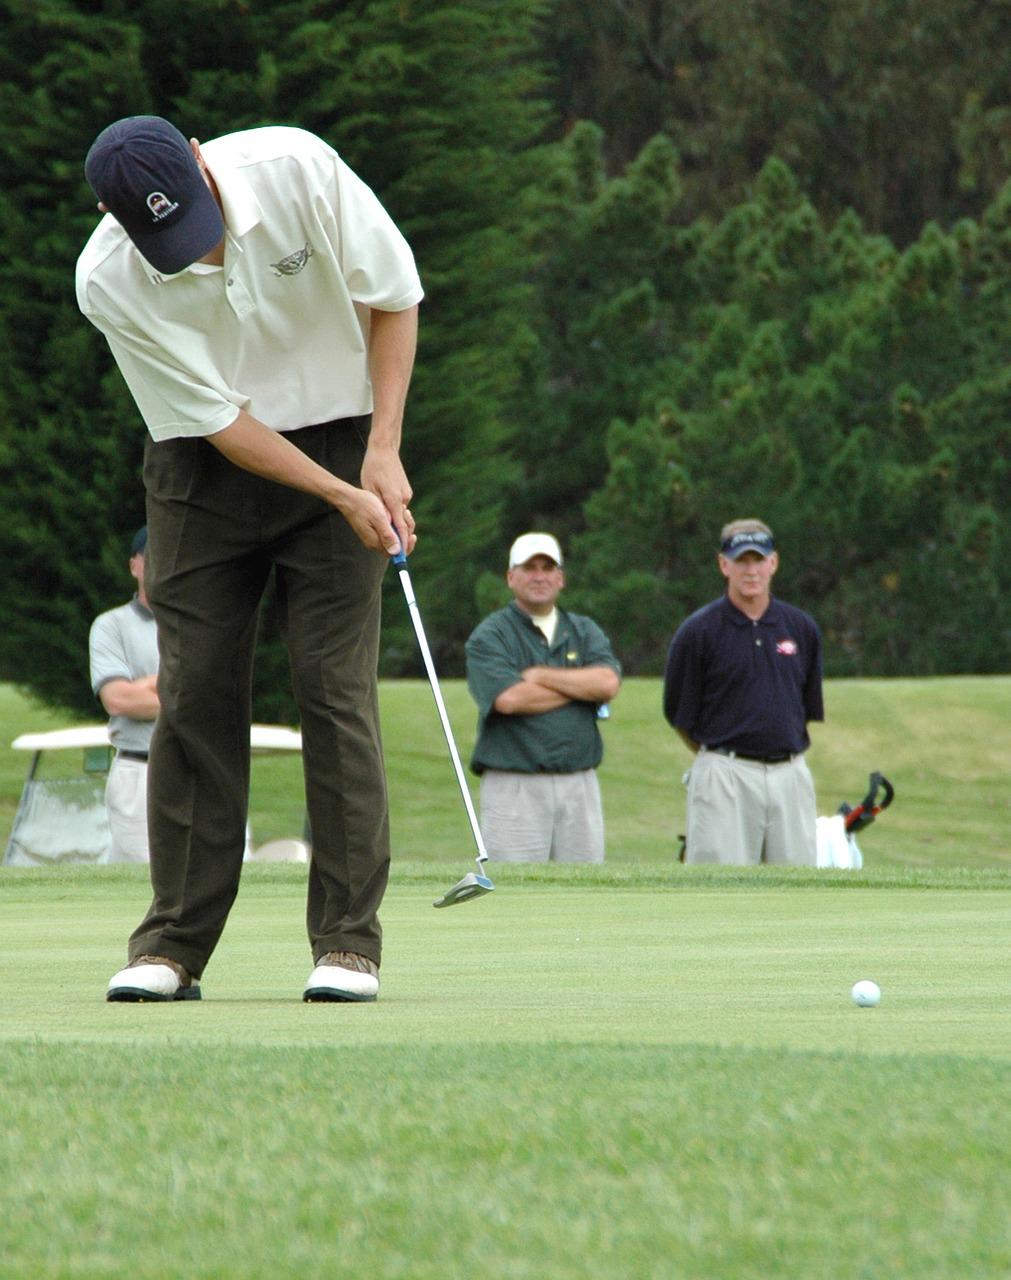 A golfer ready for hitting a tee shot